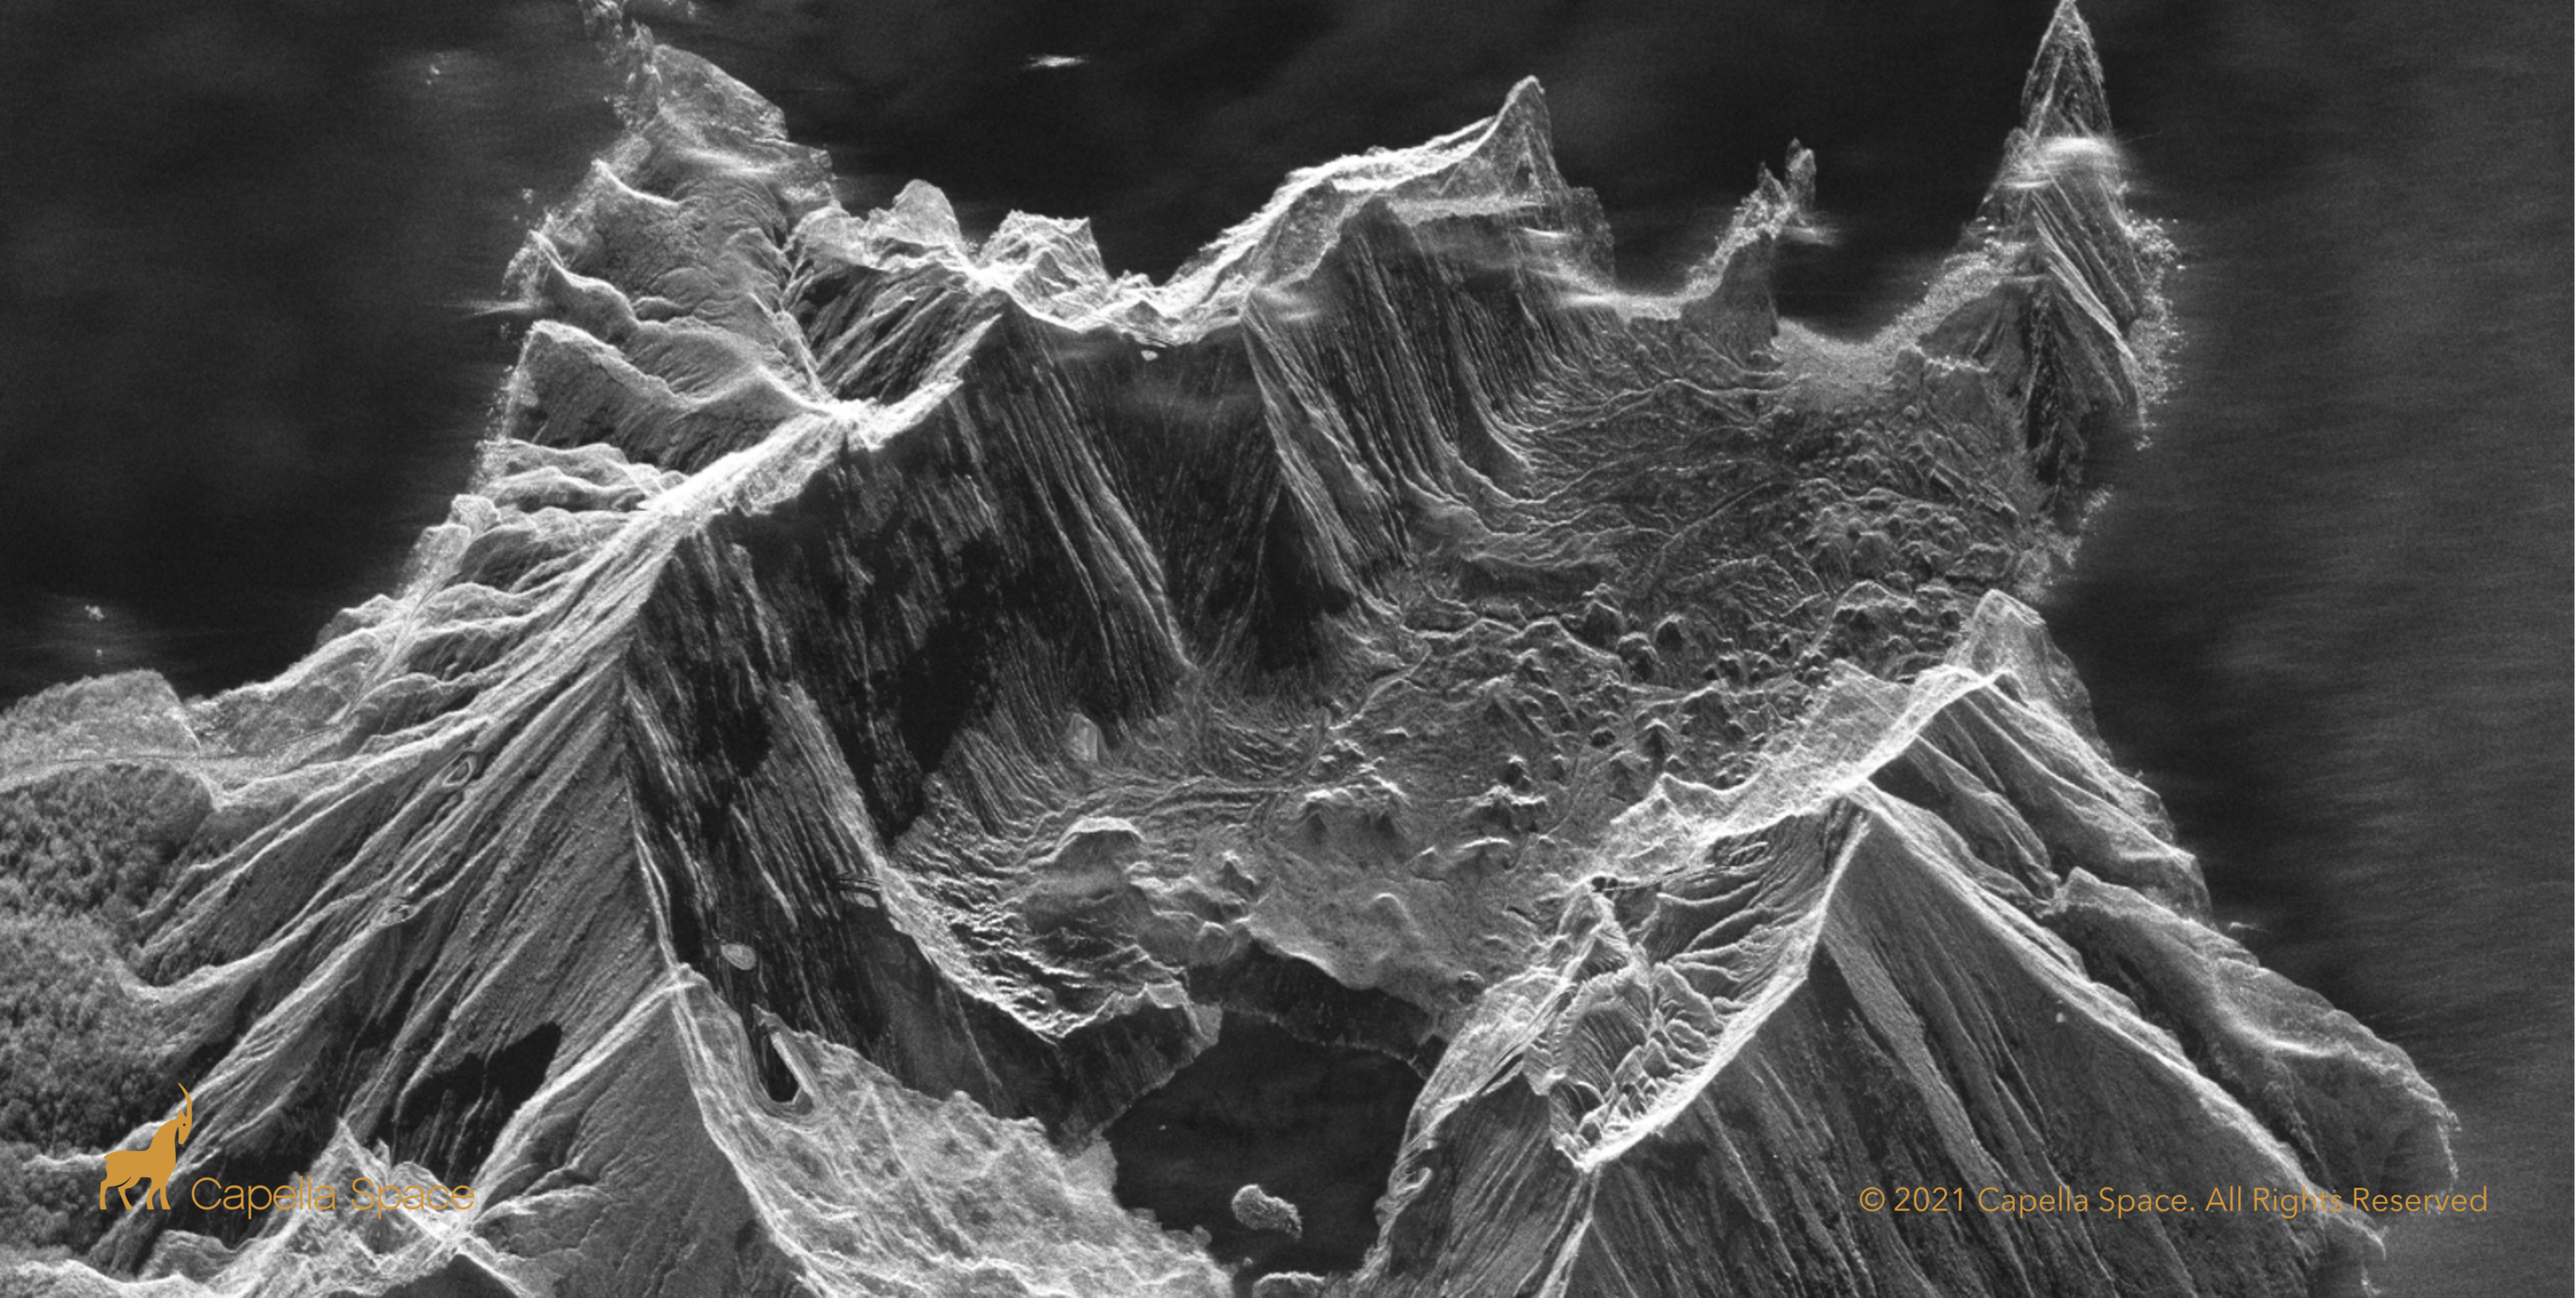 Whakaari/white Island, New Zealand satellites pictures.